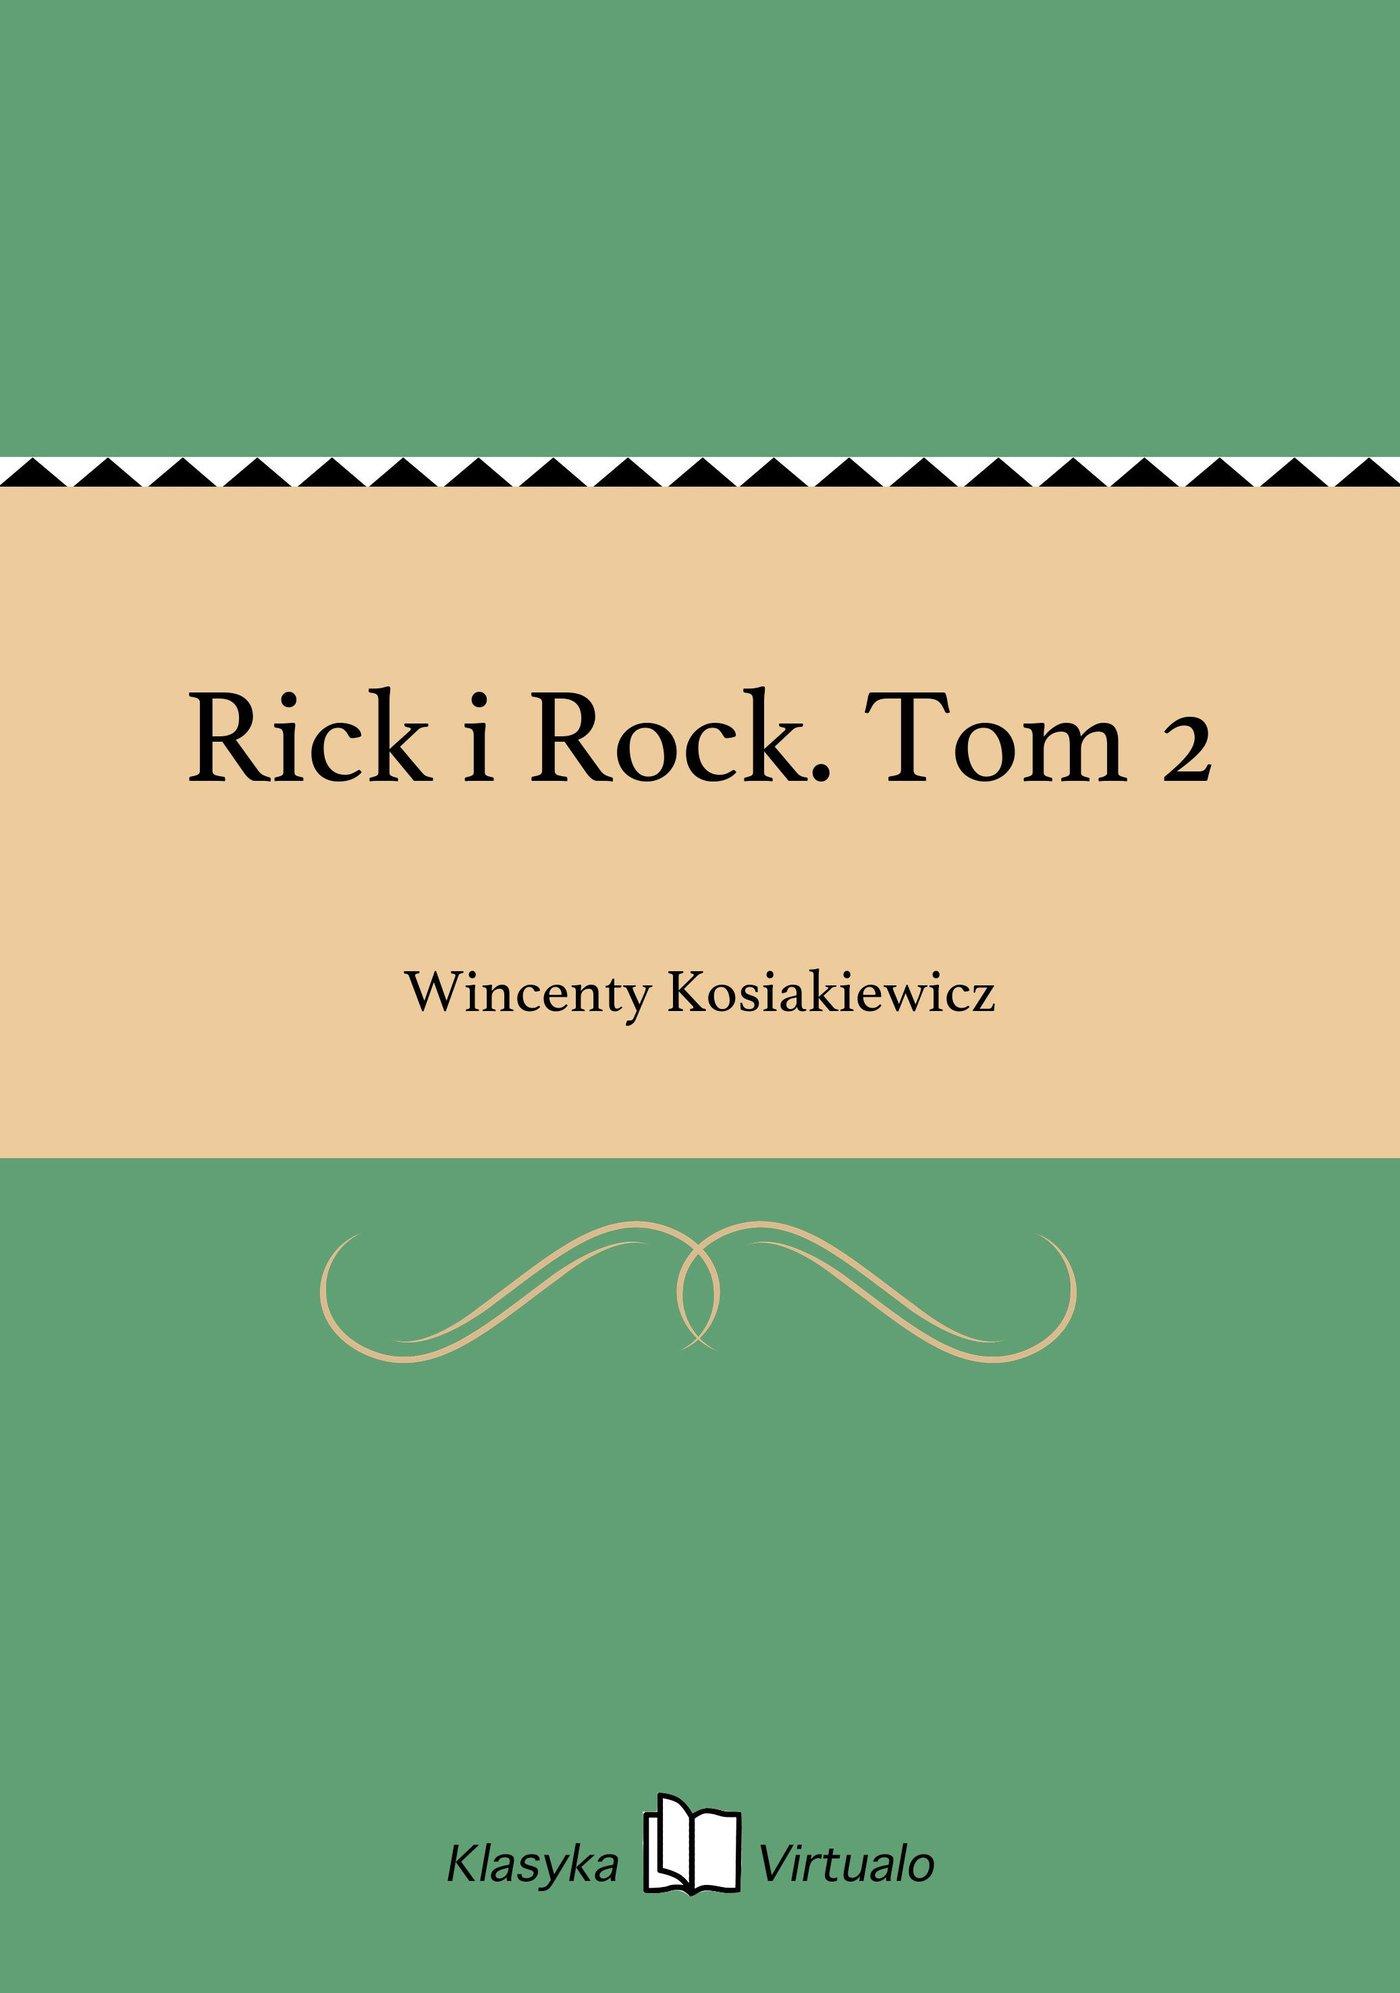 Rick i Rock. Tom 2 - Ebook (Książka na Kindle) do pobrania w formacie MOBI